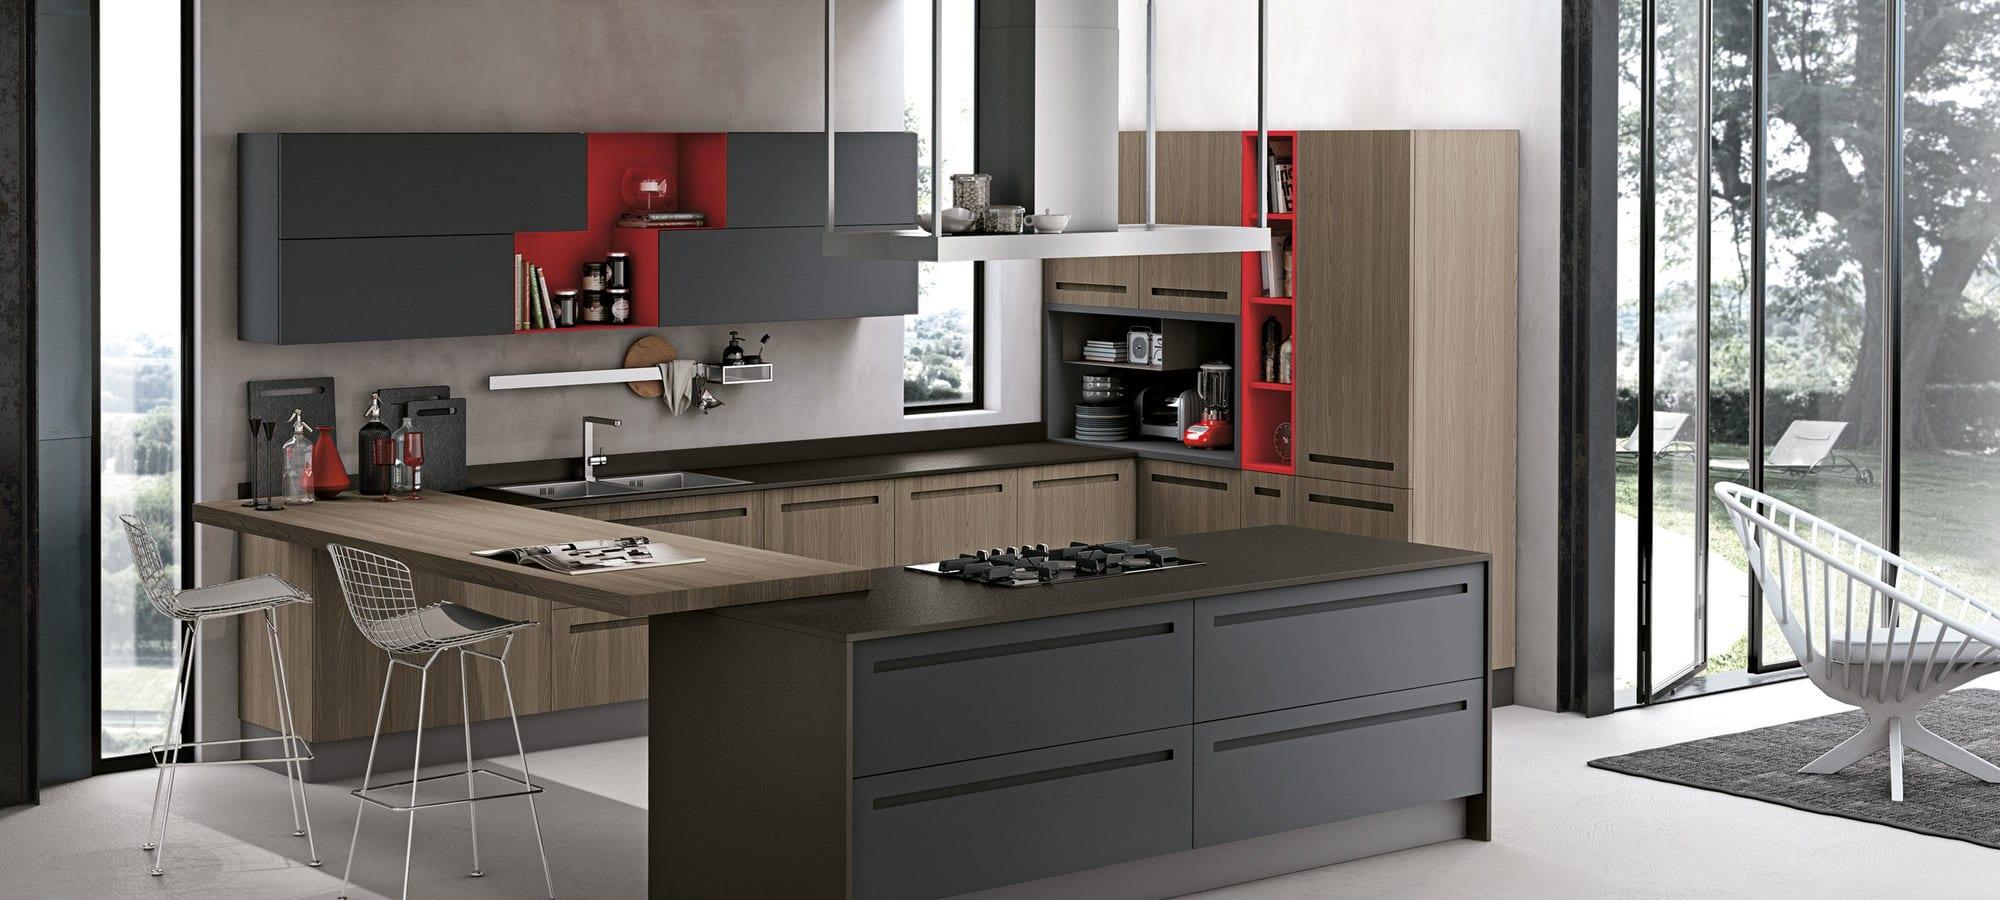 Cucina mood raimondi idee casa - Cucine stosa moderne ...